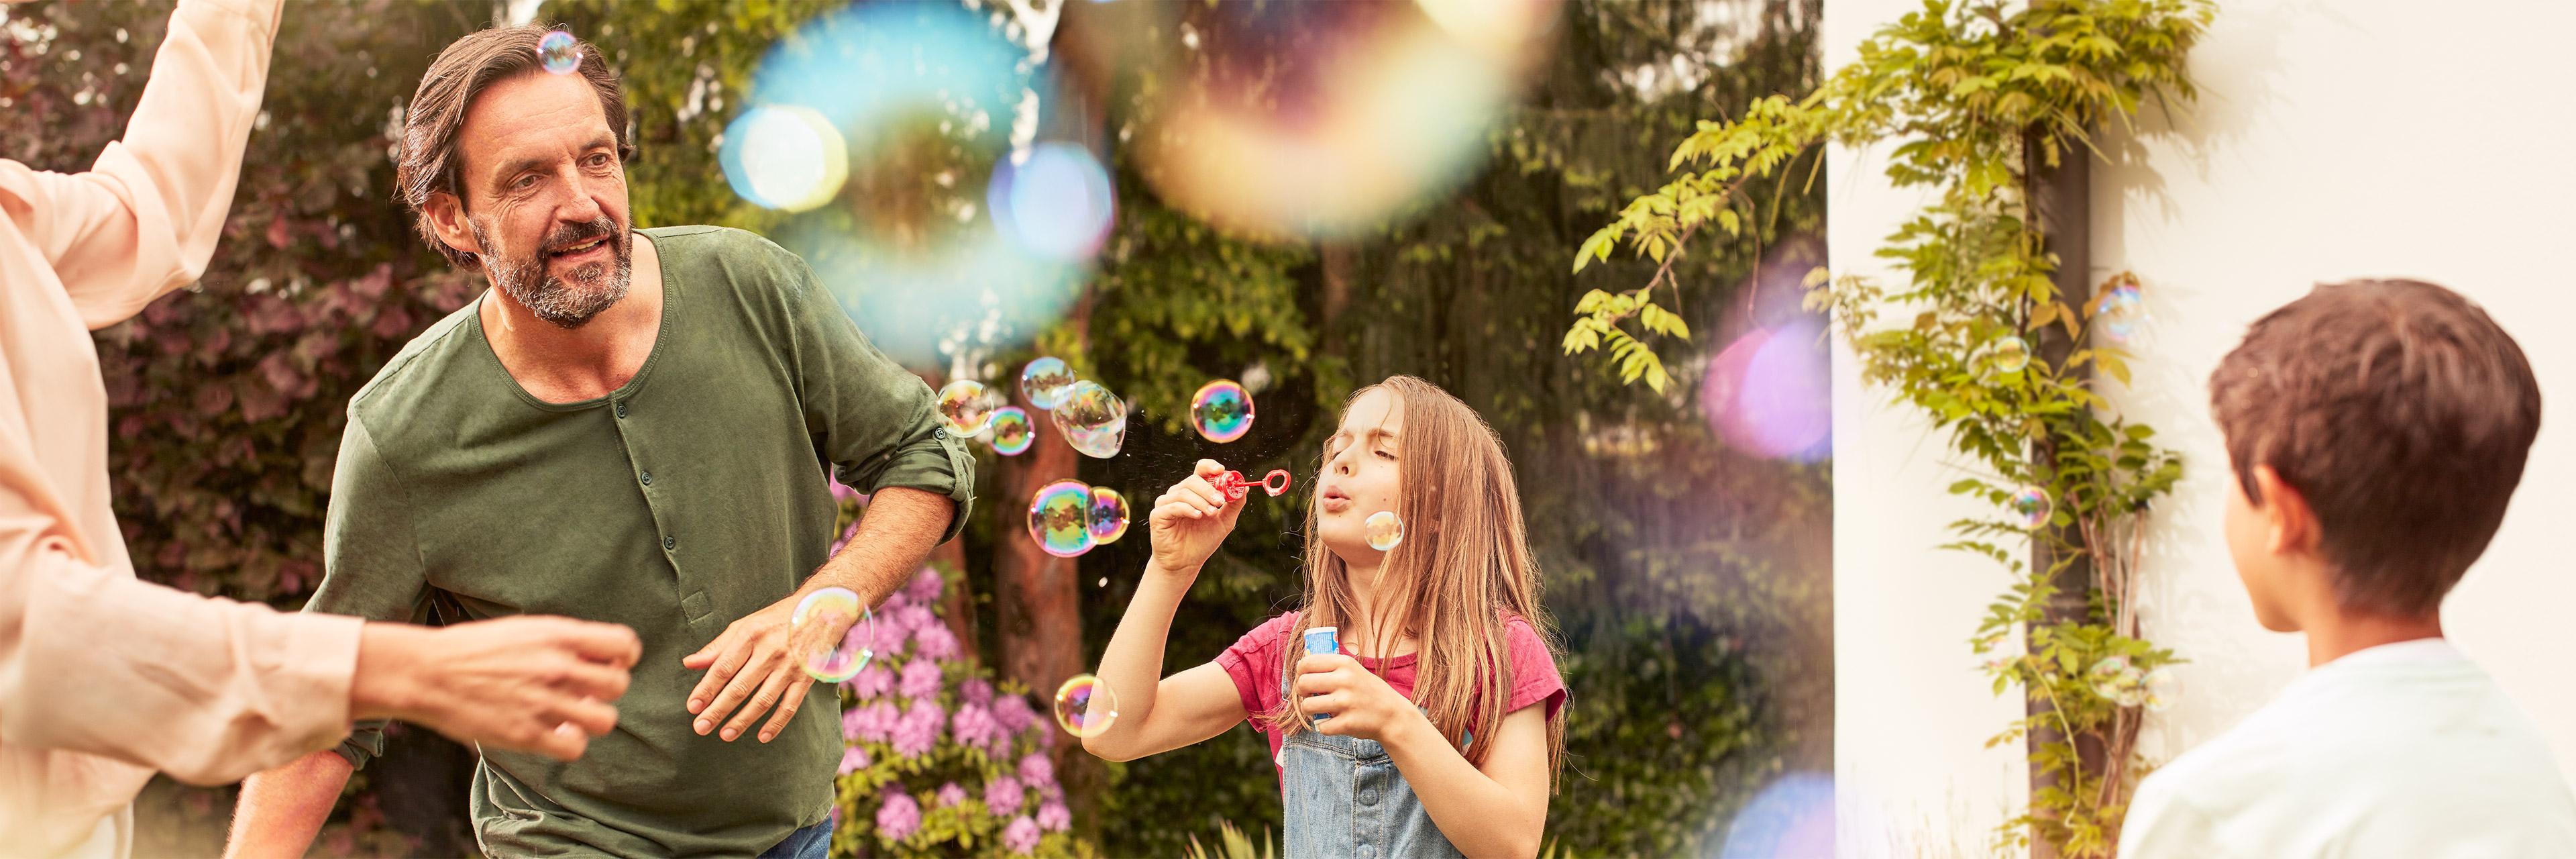 Lotus_family-bubbles_3840x1280px